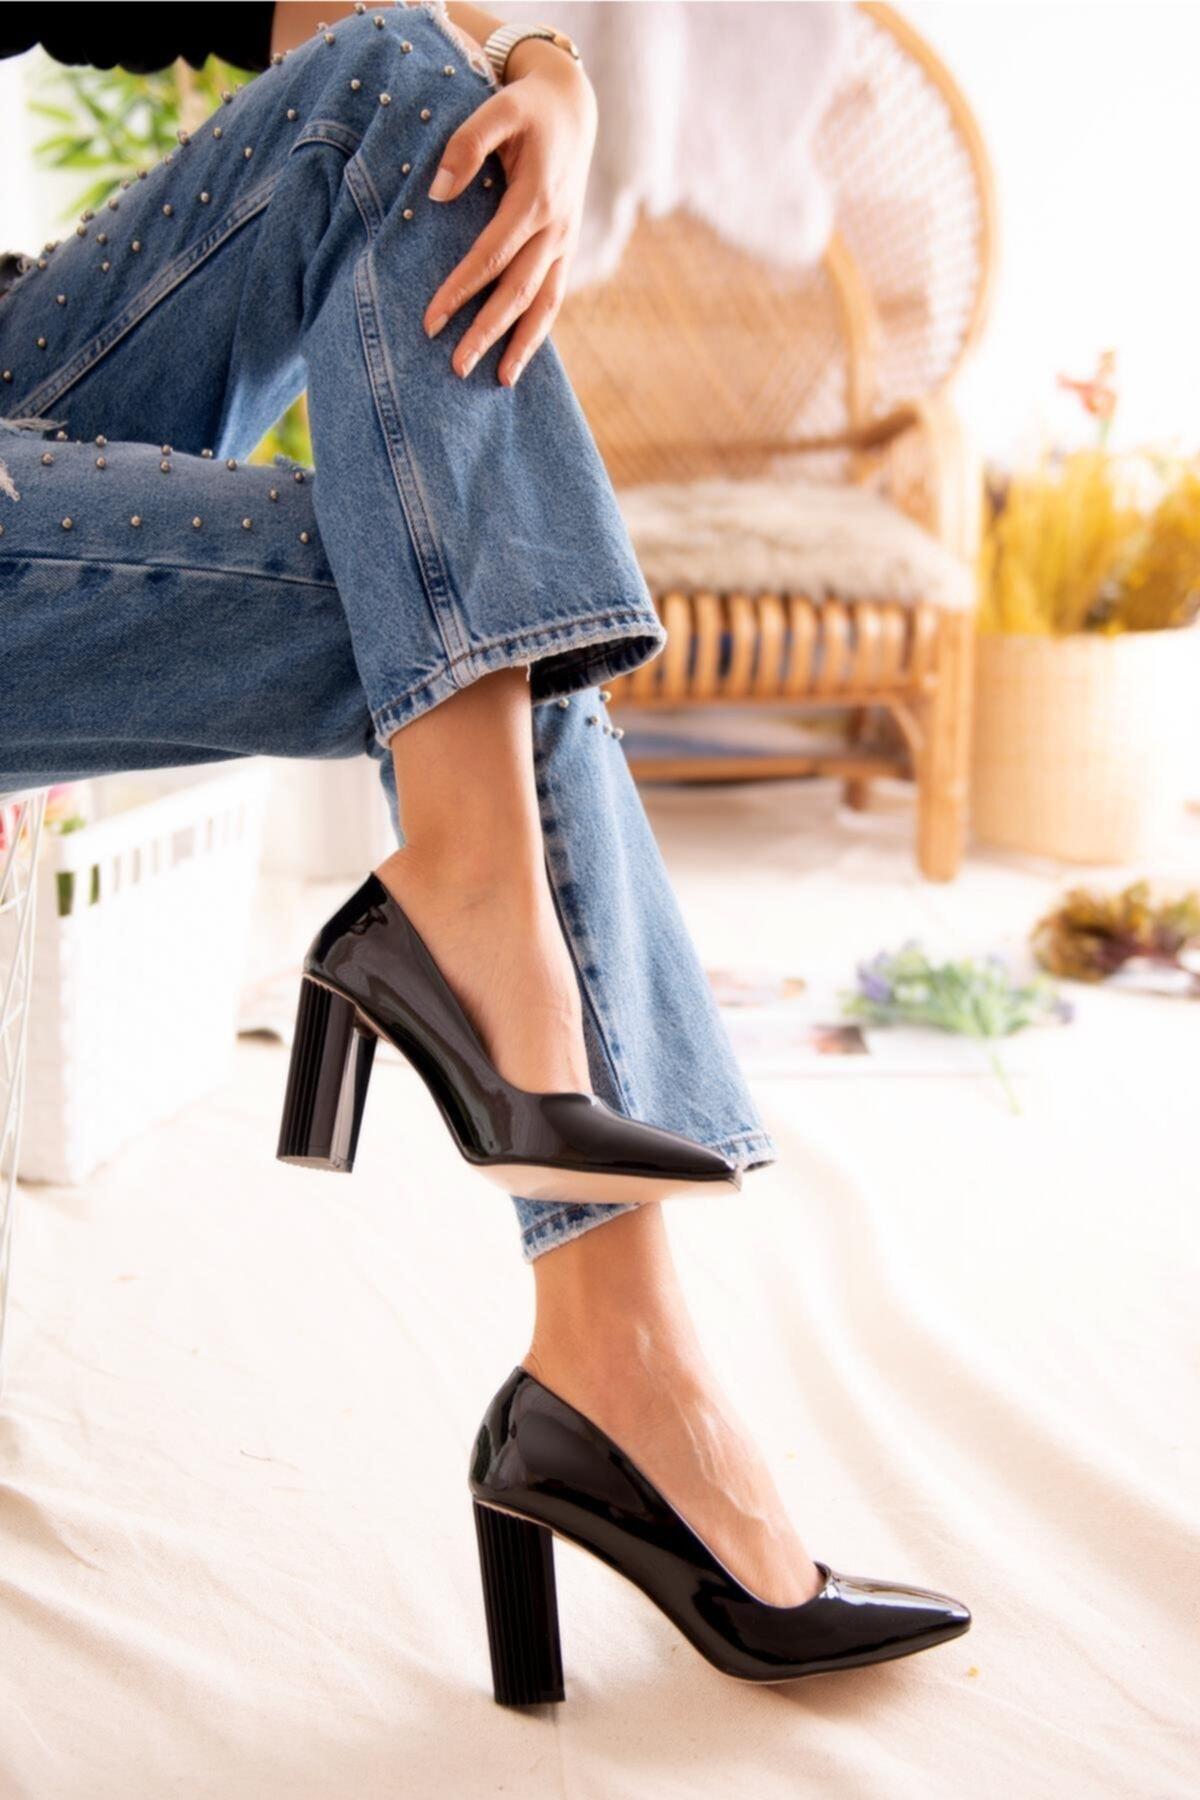 Jilberto Lainey Siyah Parlak Rugan Topuk Detaylı Ayakkabı